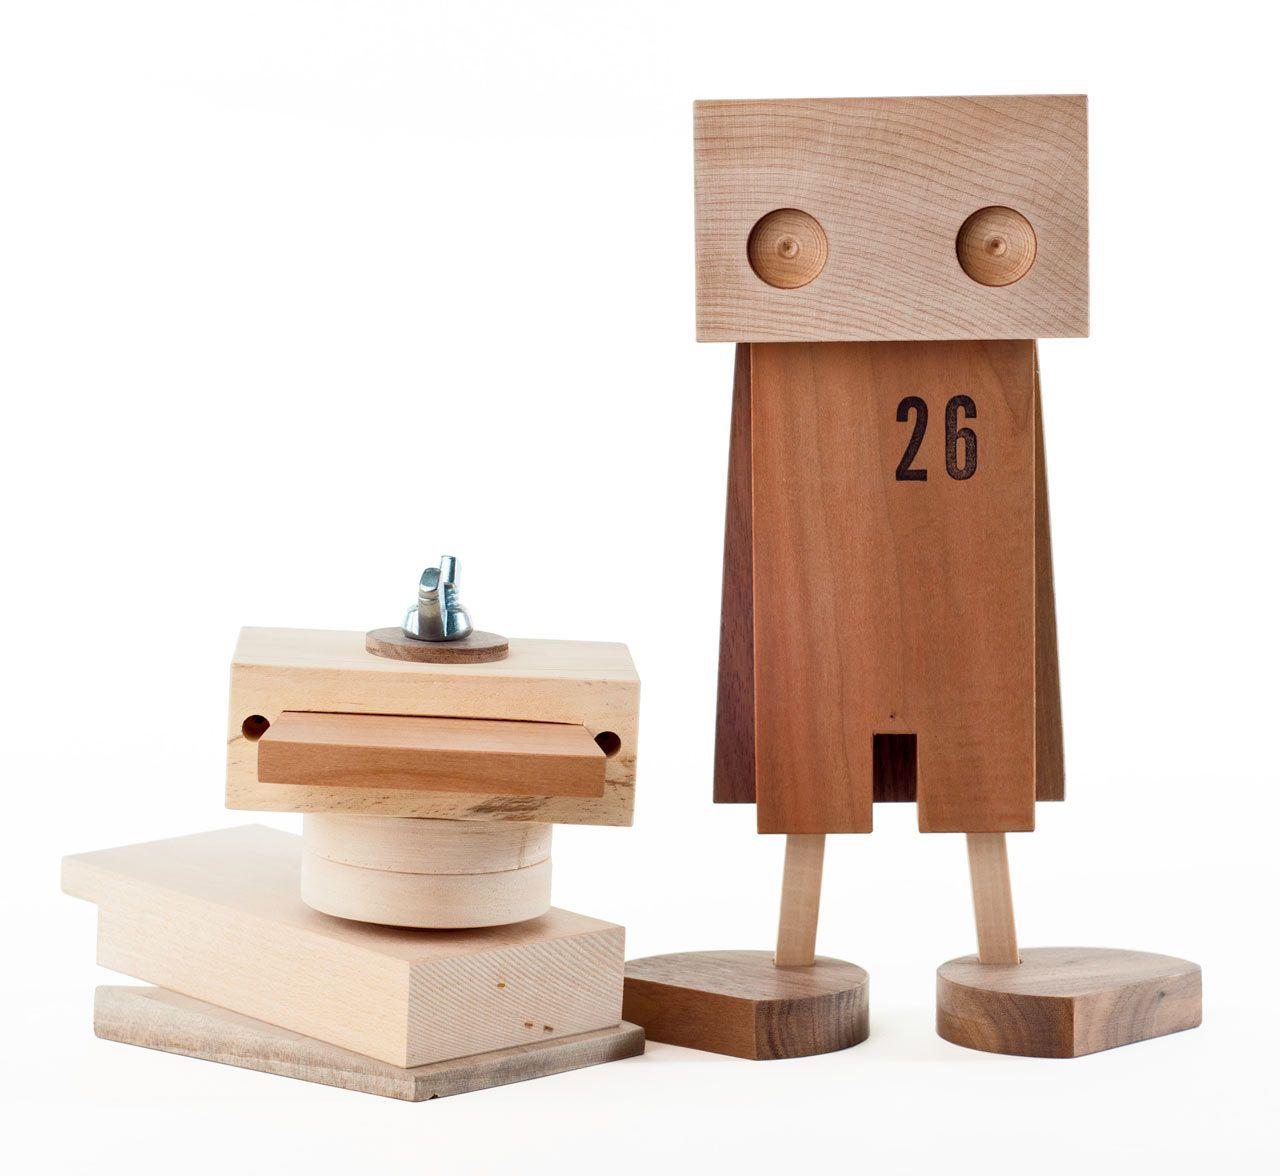 handmade wooden toys made from scrap wood — design milk